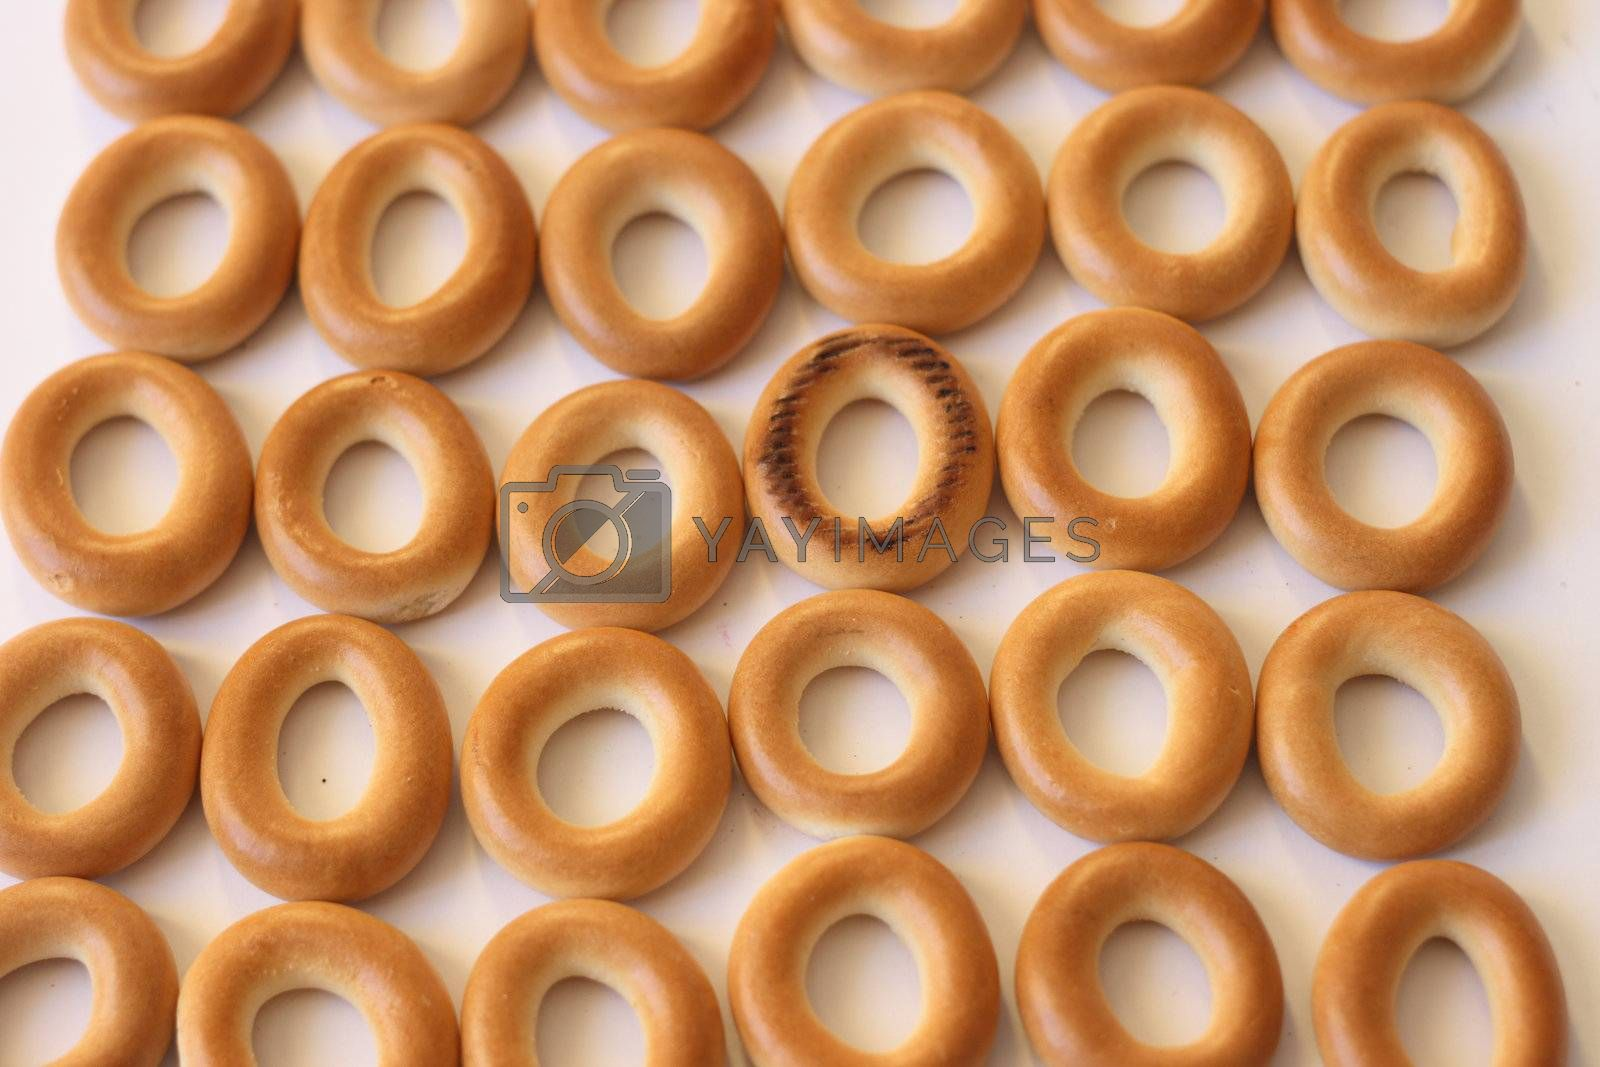 bagels by sagasan